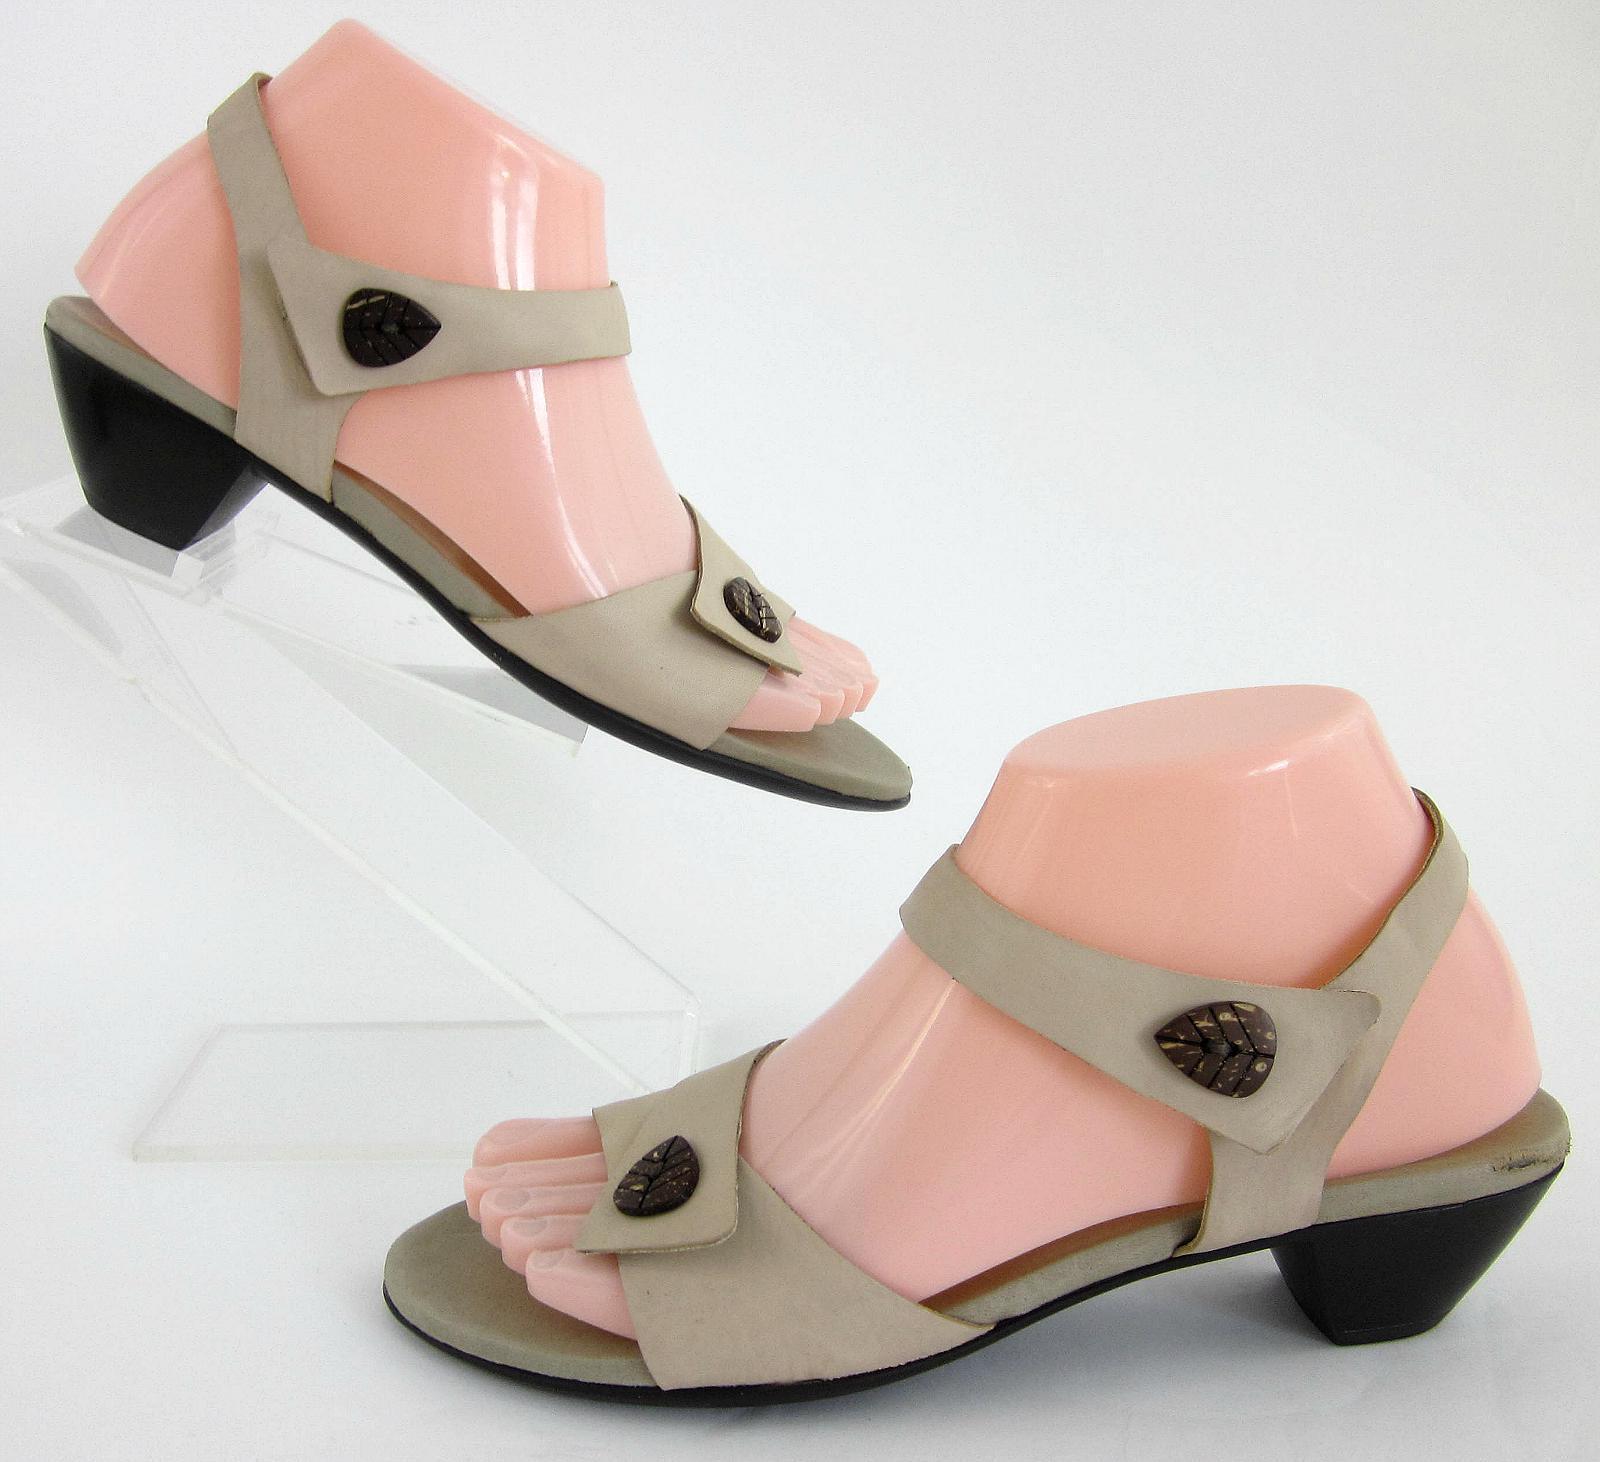 Munro American 'Palau' Calfskin Sandals Natural Tan Sz 7.5N Narrow